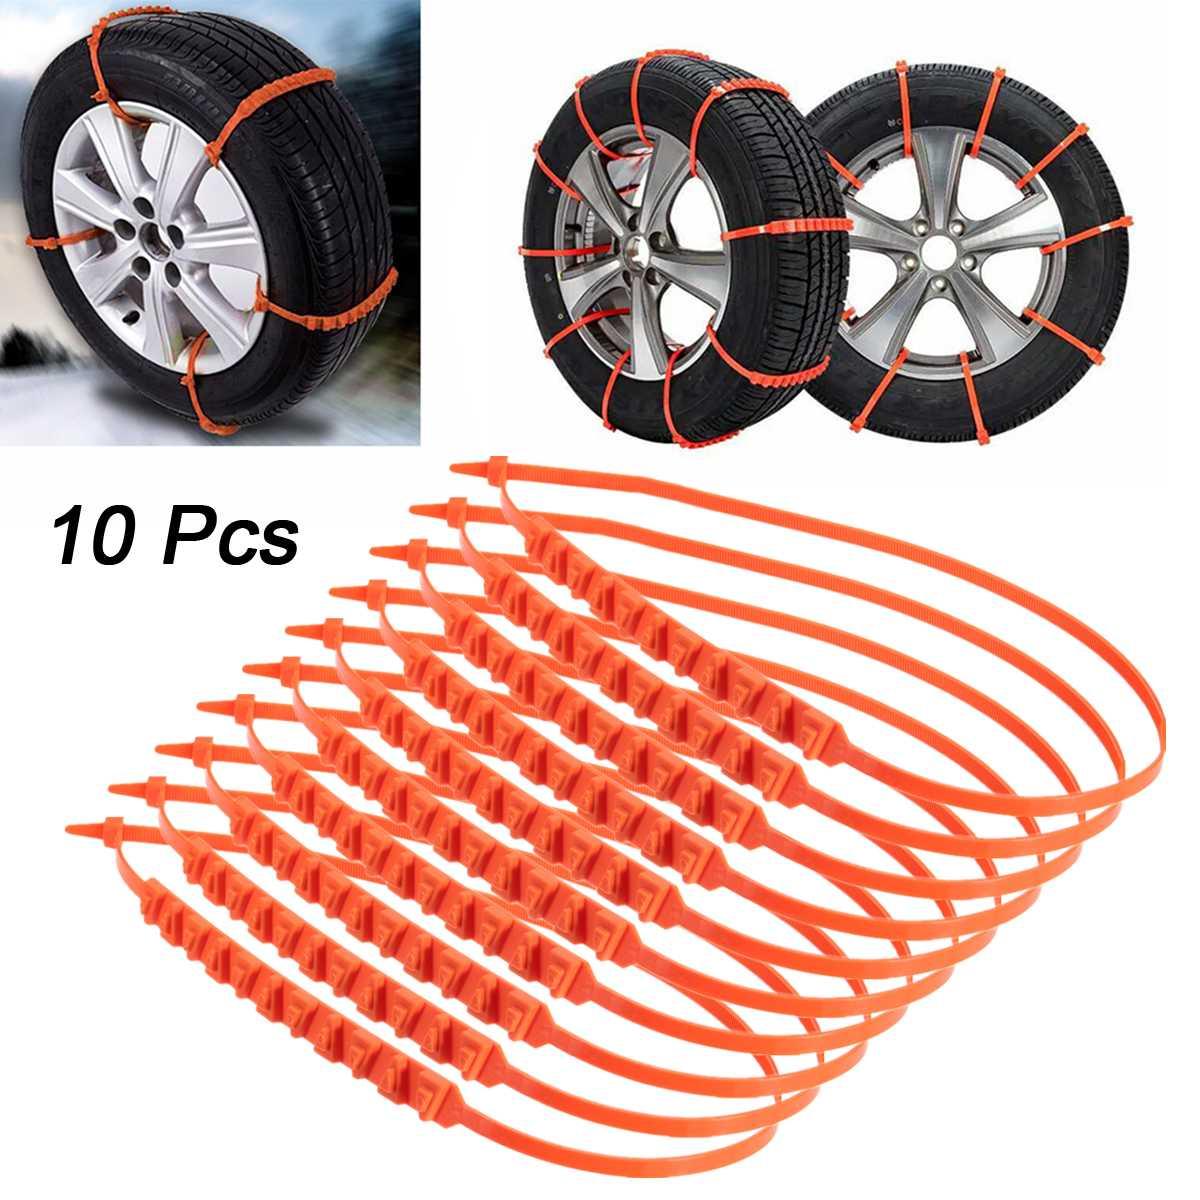 5pcs 10Pcs Car font b Snow b font Tire Anti skid font b Chains b font